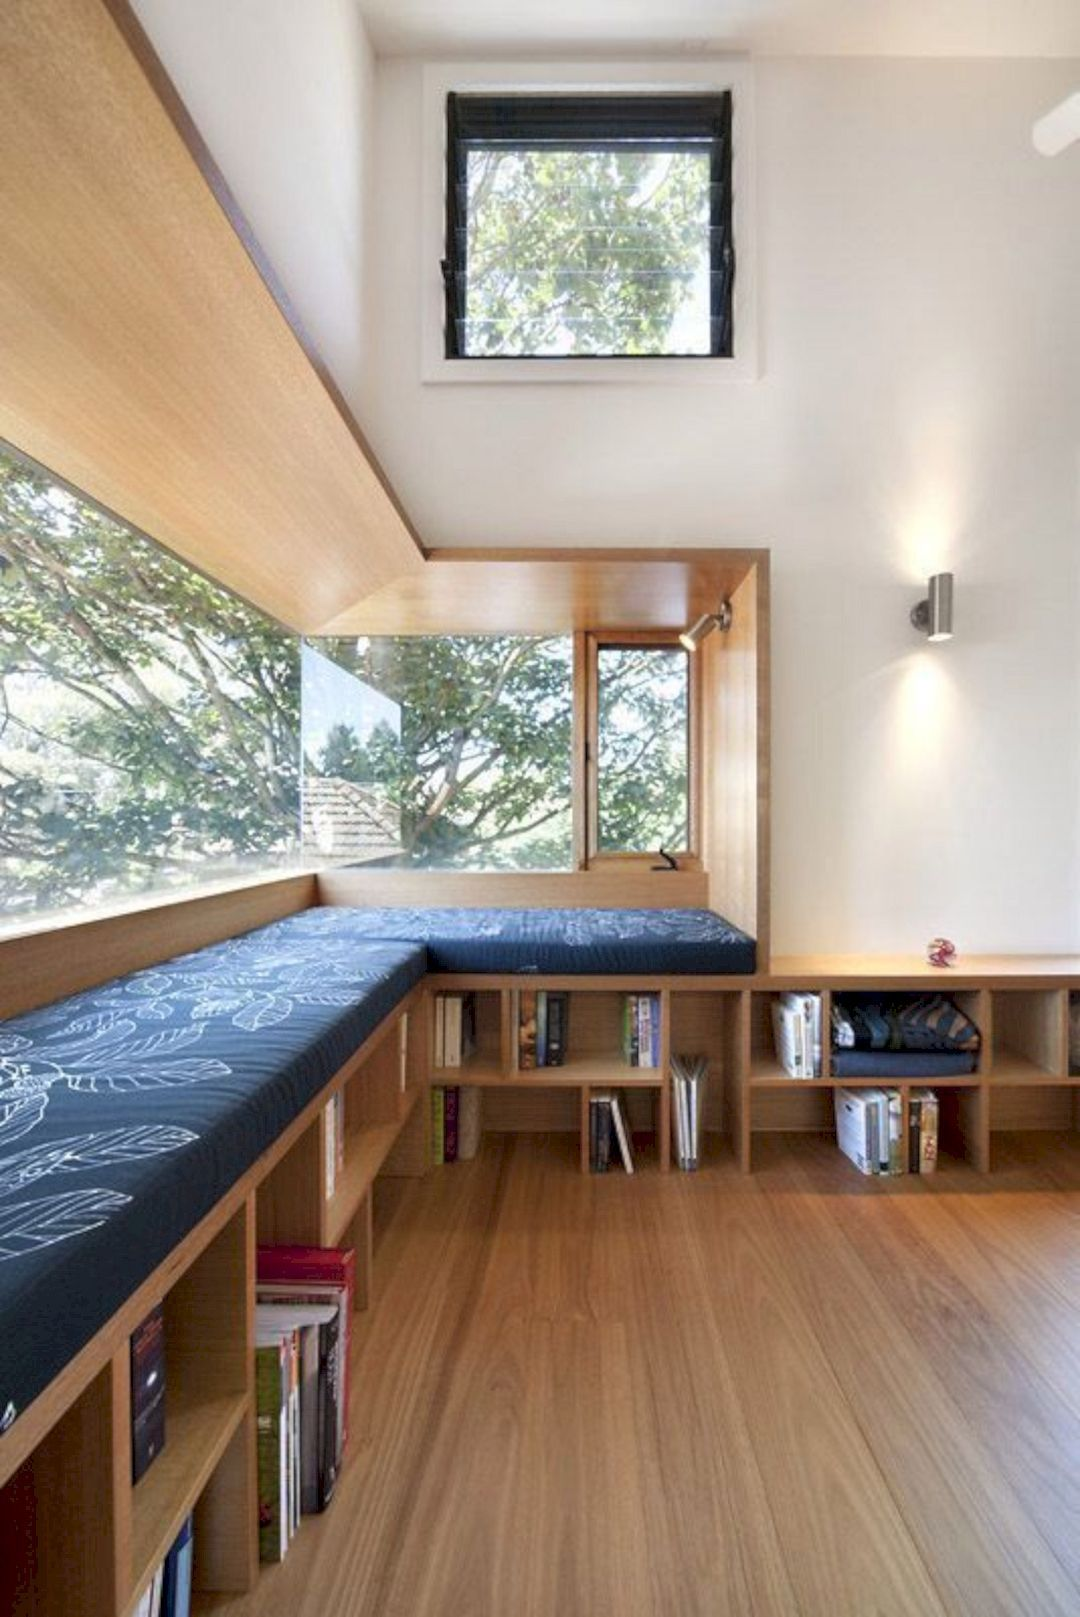 Modern Interior with Stunning Bookshelf Ideas for Book Lovers https://www.futuristarchitecture.com/25808-interior-with-stunning-bookshelf.html